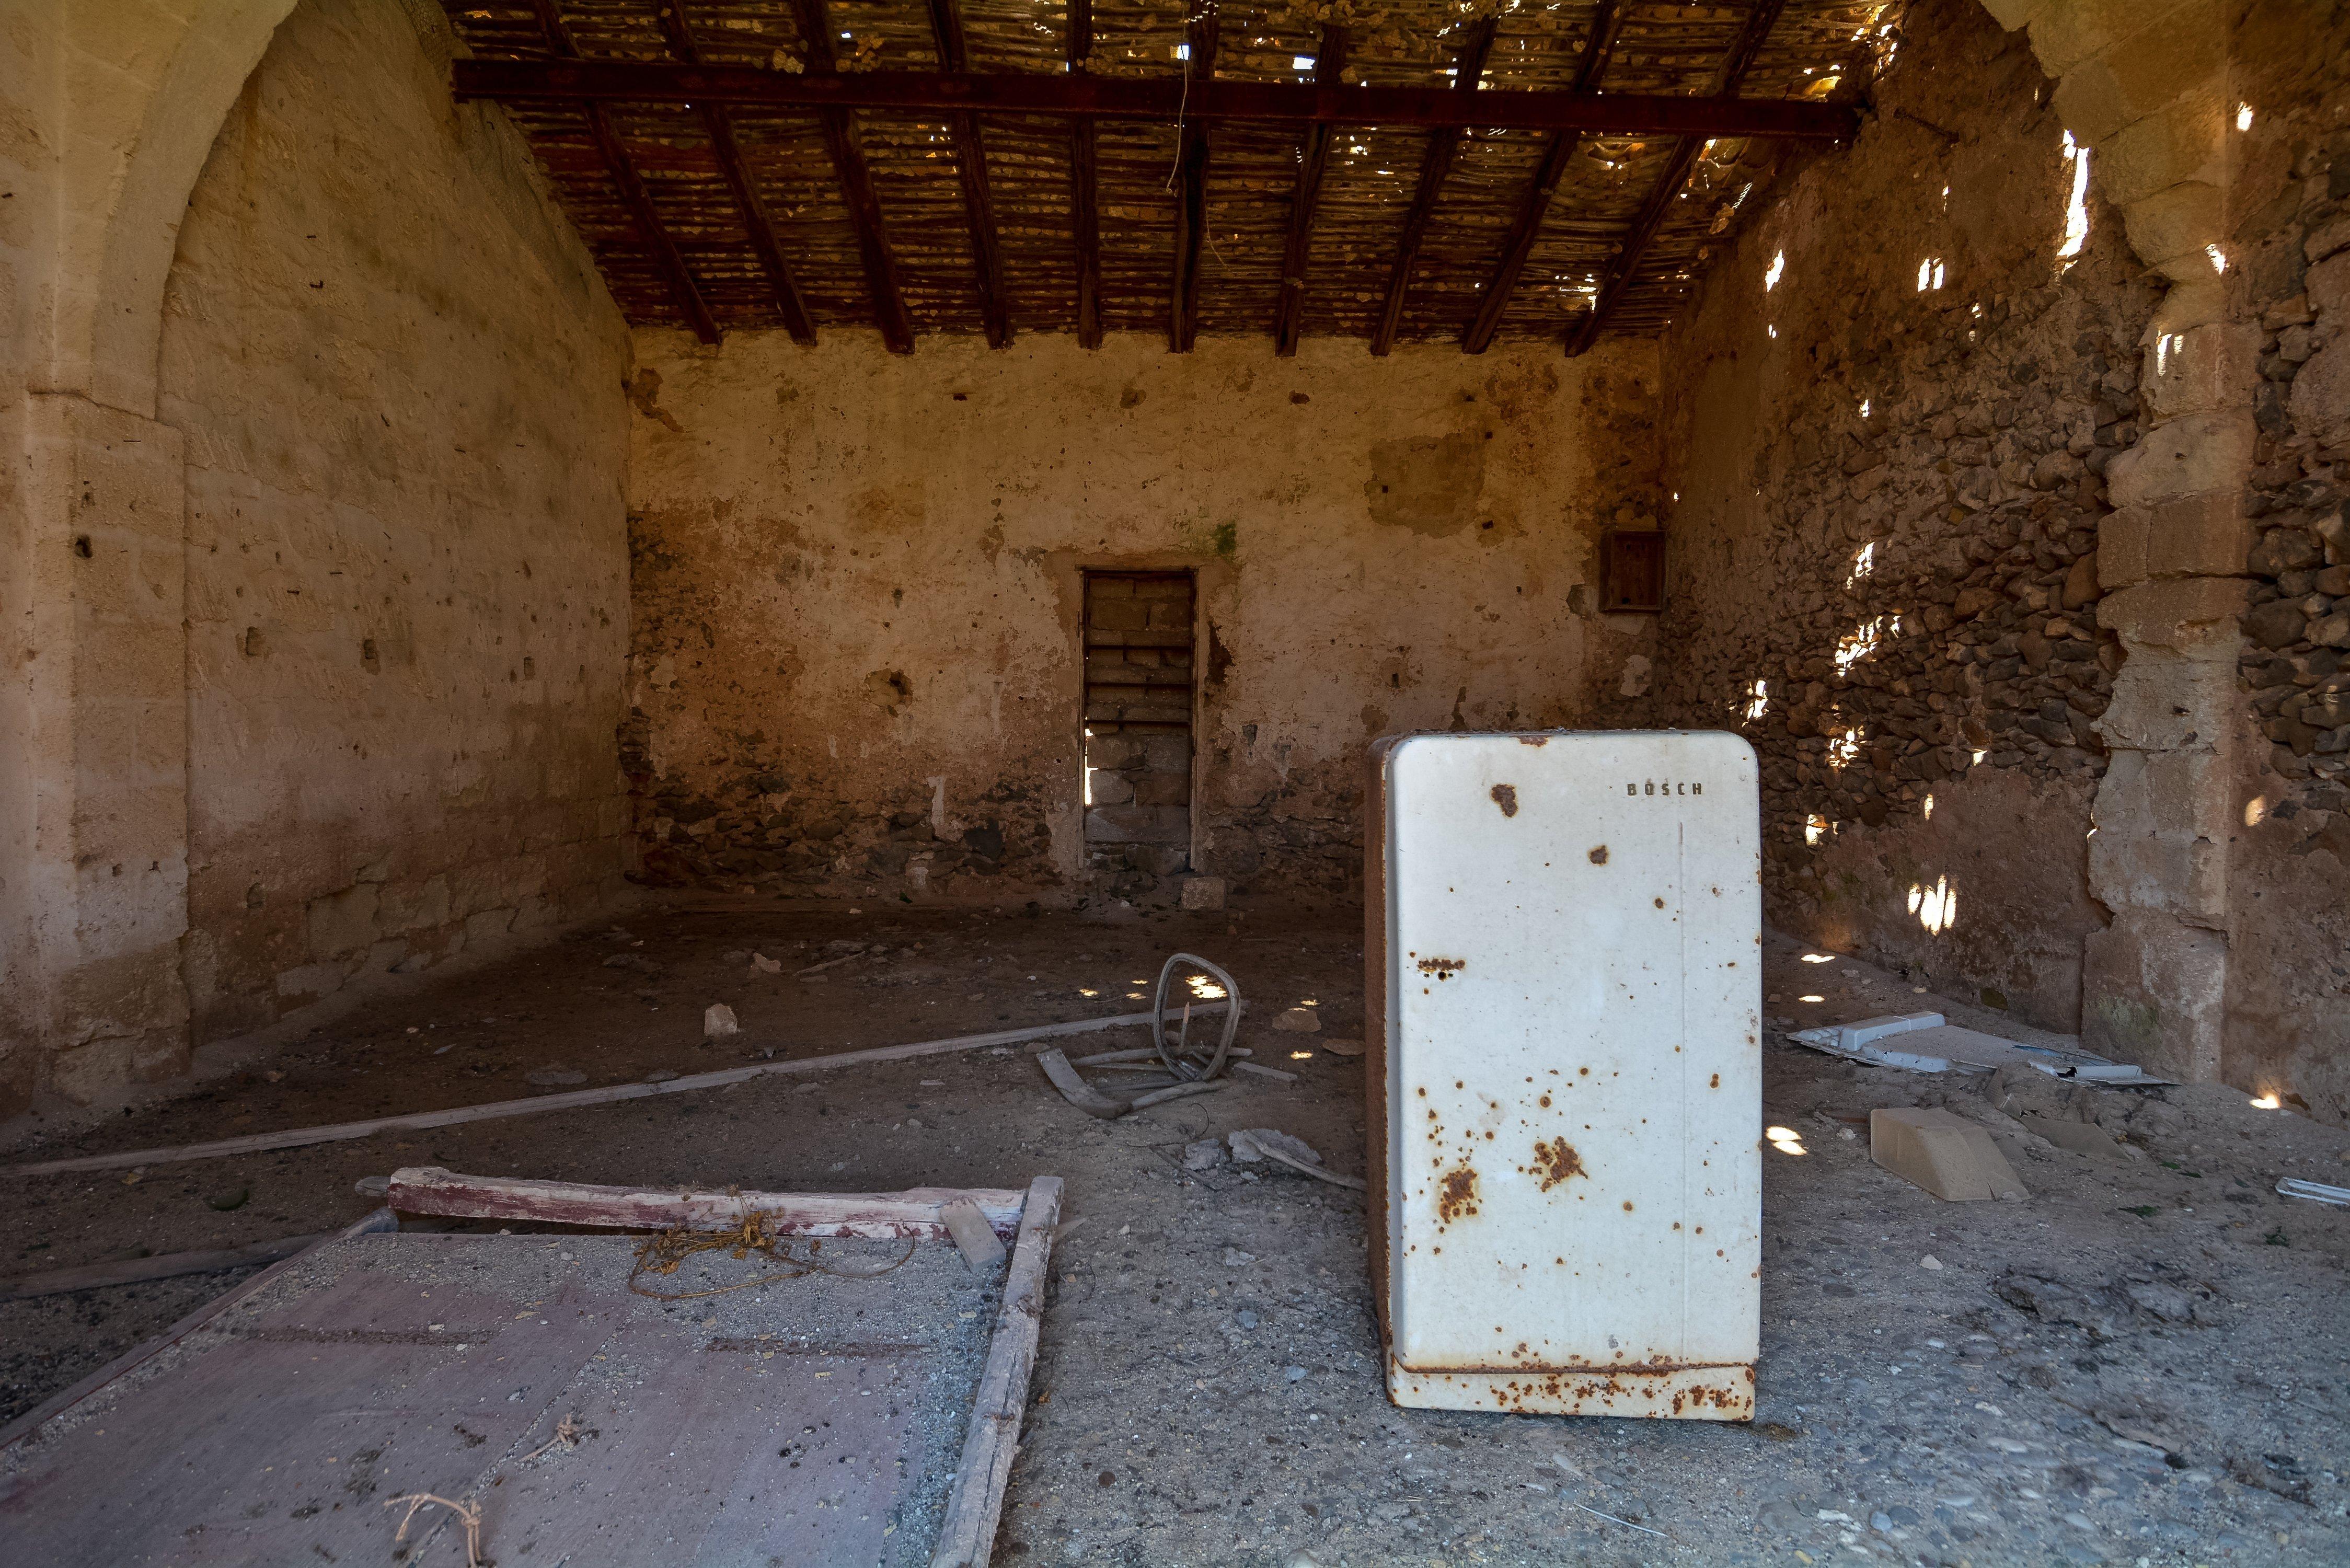 ruins tuna factory fishing san vito lo capo tonnara del secco abandoned urbex lost places italy sicily courtyard interior trash refridgerator